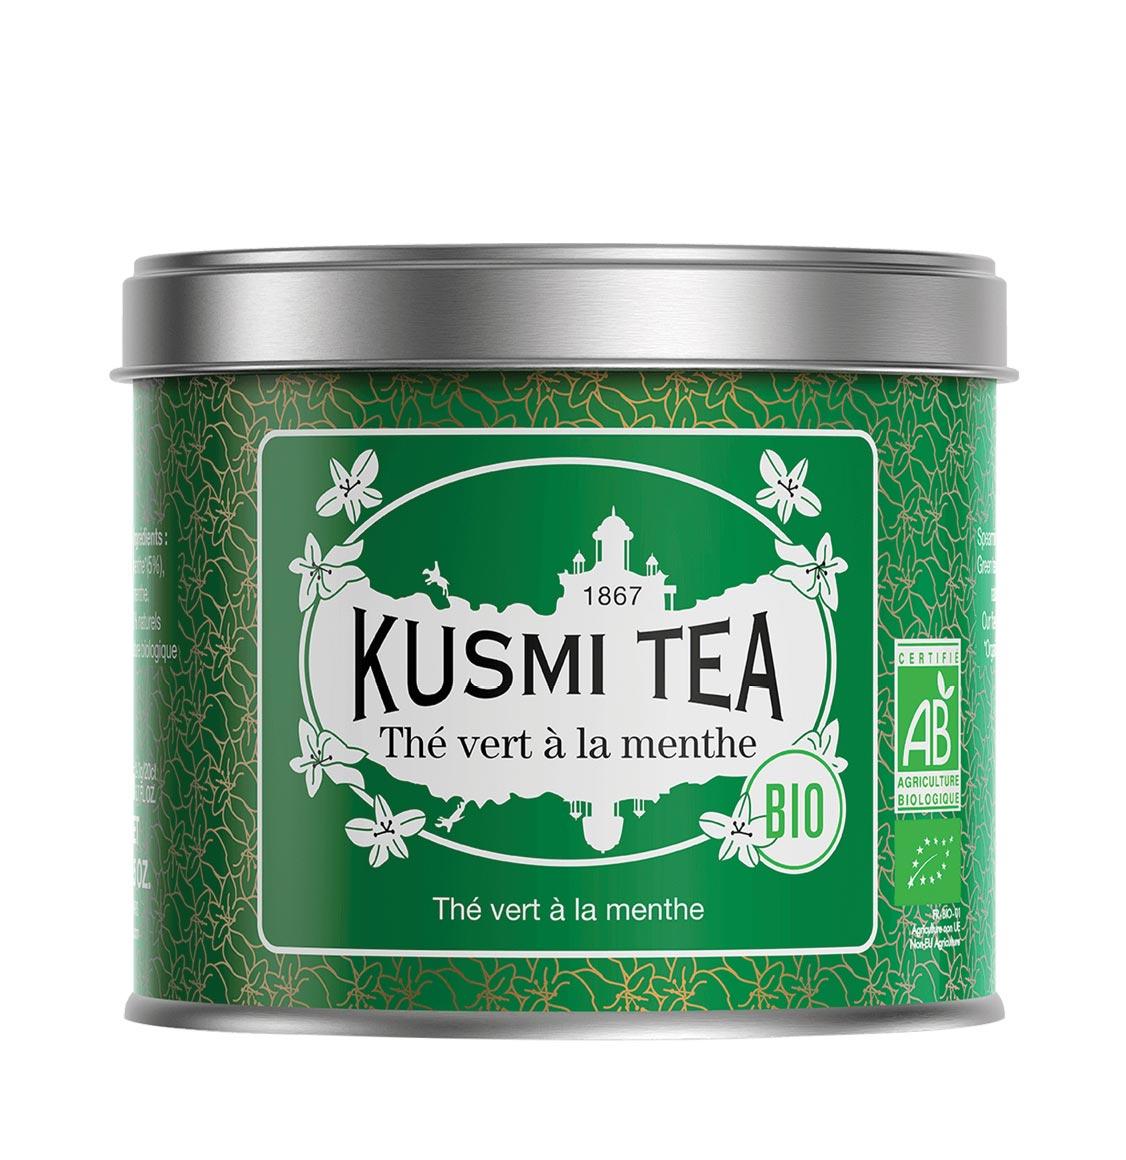 Kusmi Spearmint Organic Green Tea 100g